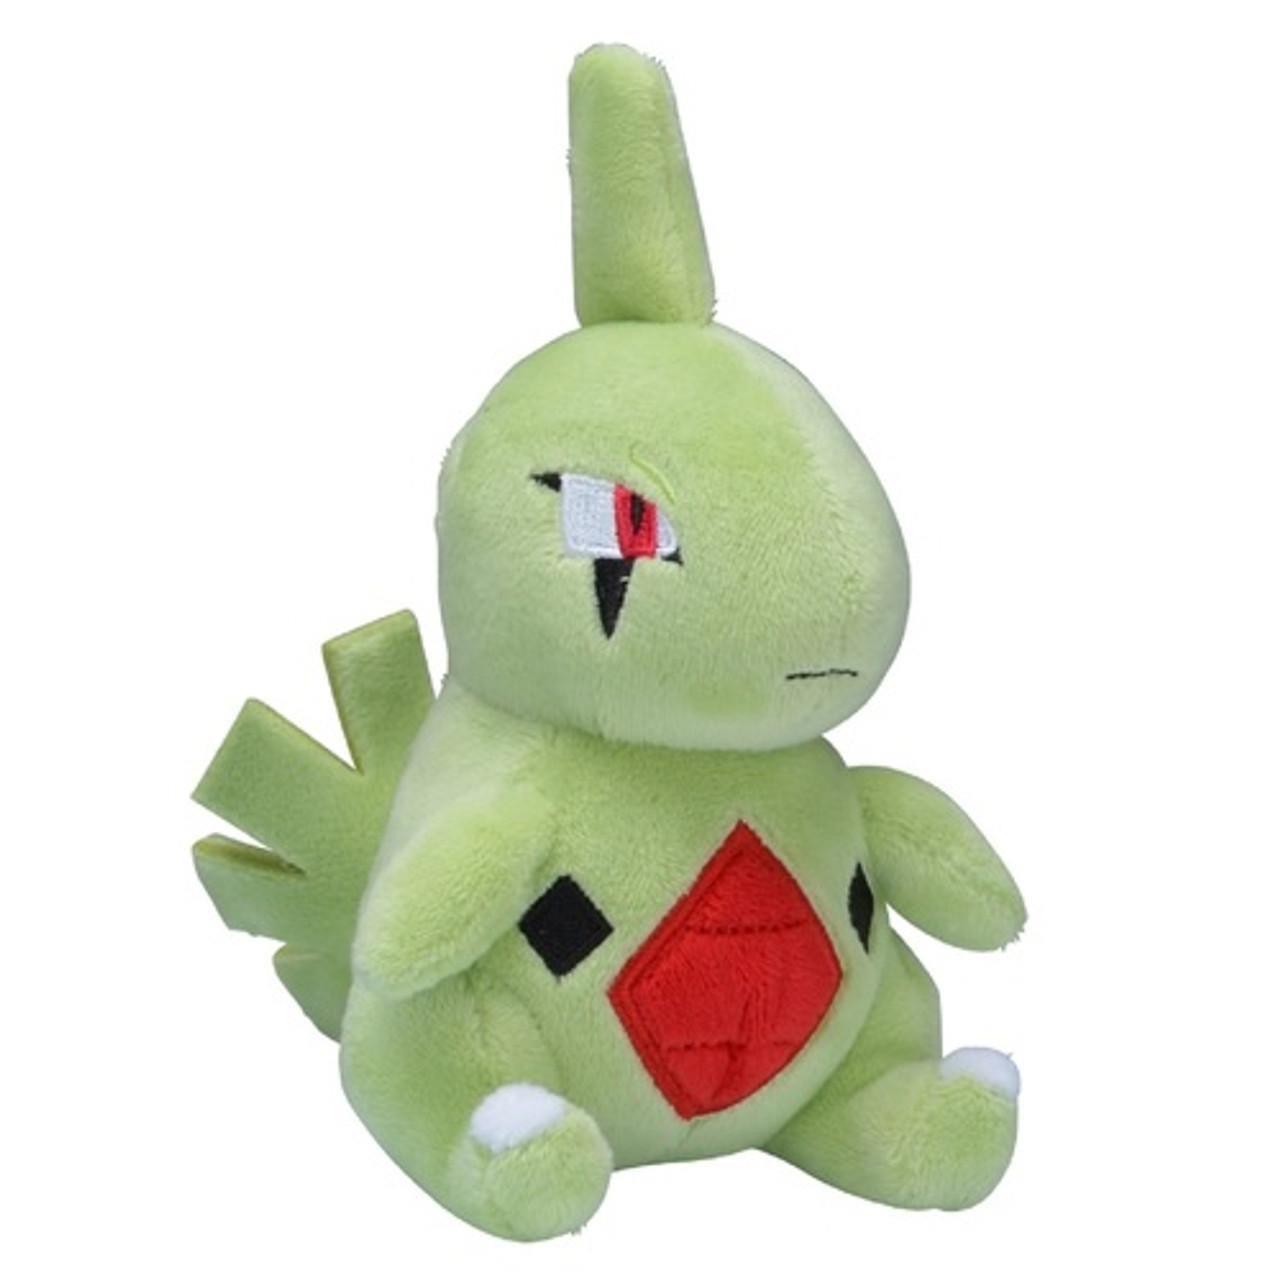 Balkie 4521329269153 Pokemon Center Original Plush Doll Pokemon fit Tyrogue